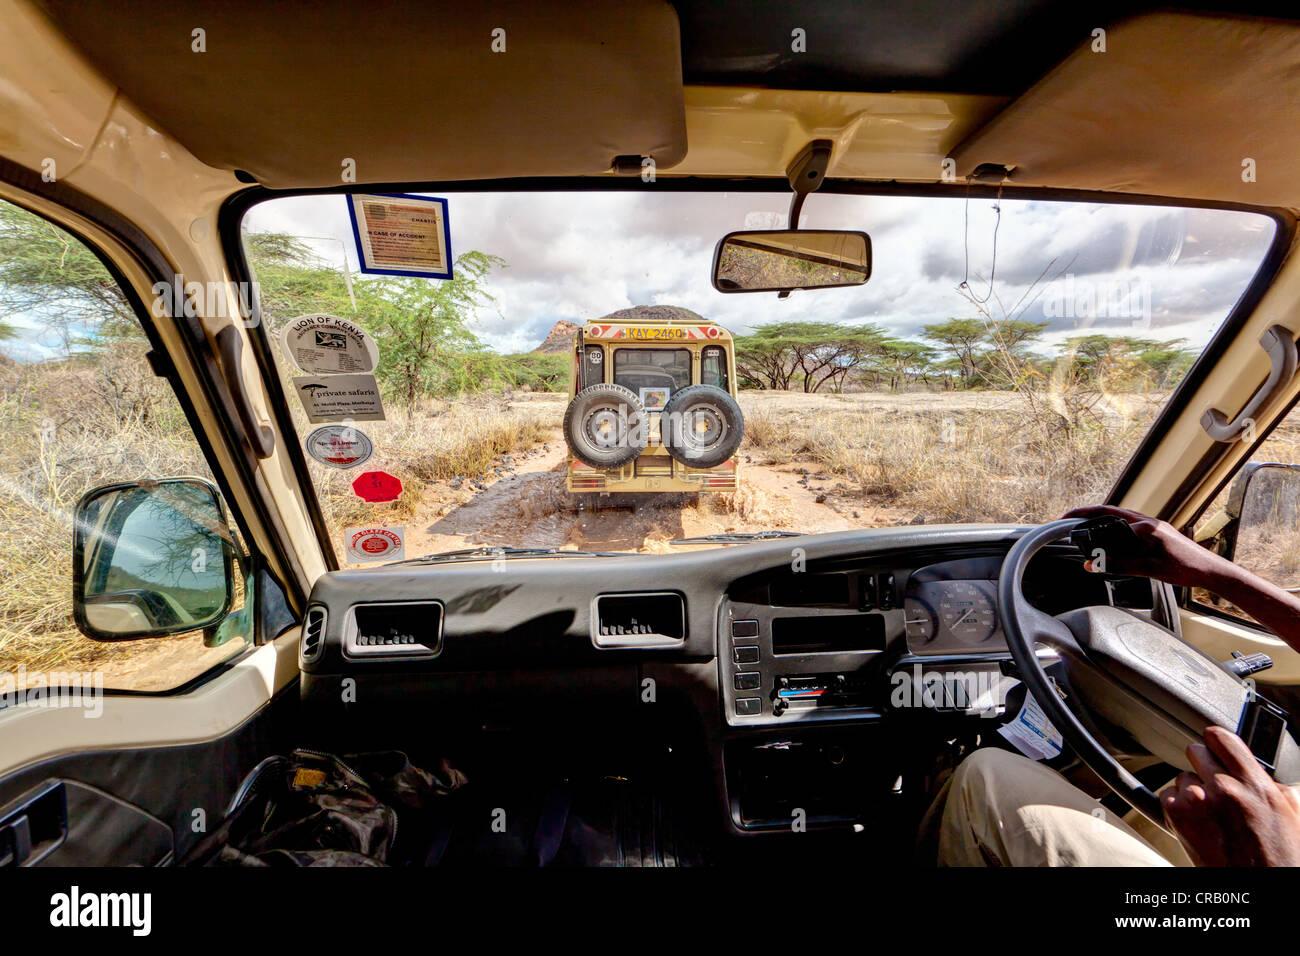 Safari bus following a Landrover over wet dirt tracks in the Samburu National Reserve, Kenya, East Africa, Africa, - Stock Image